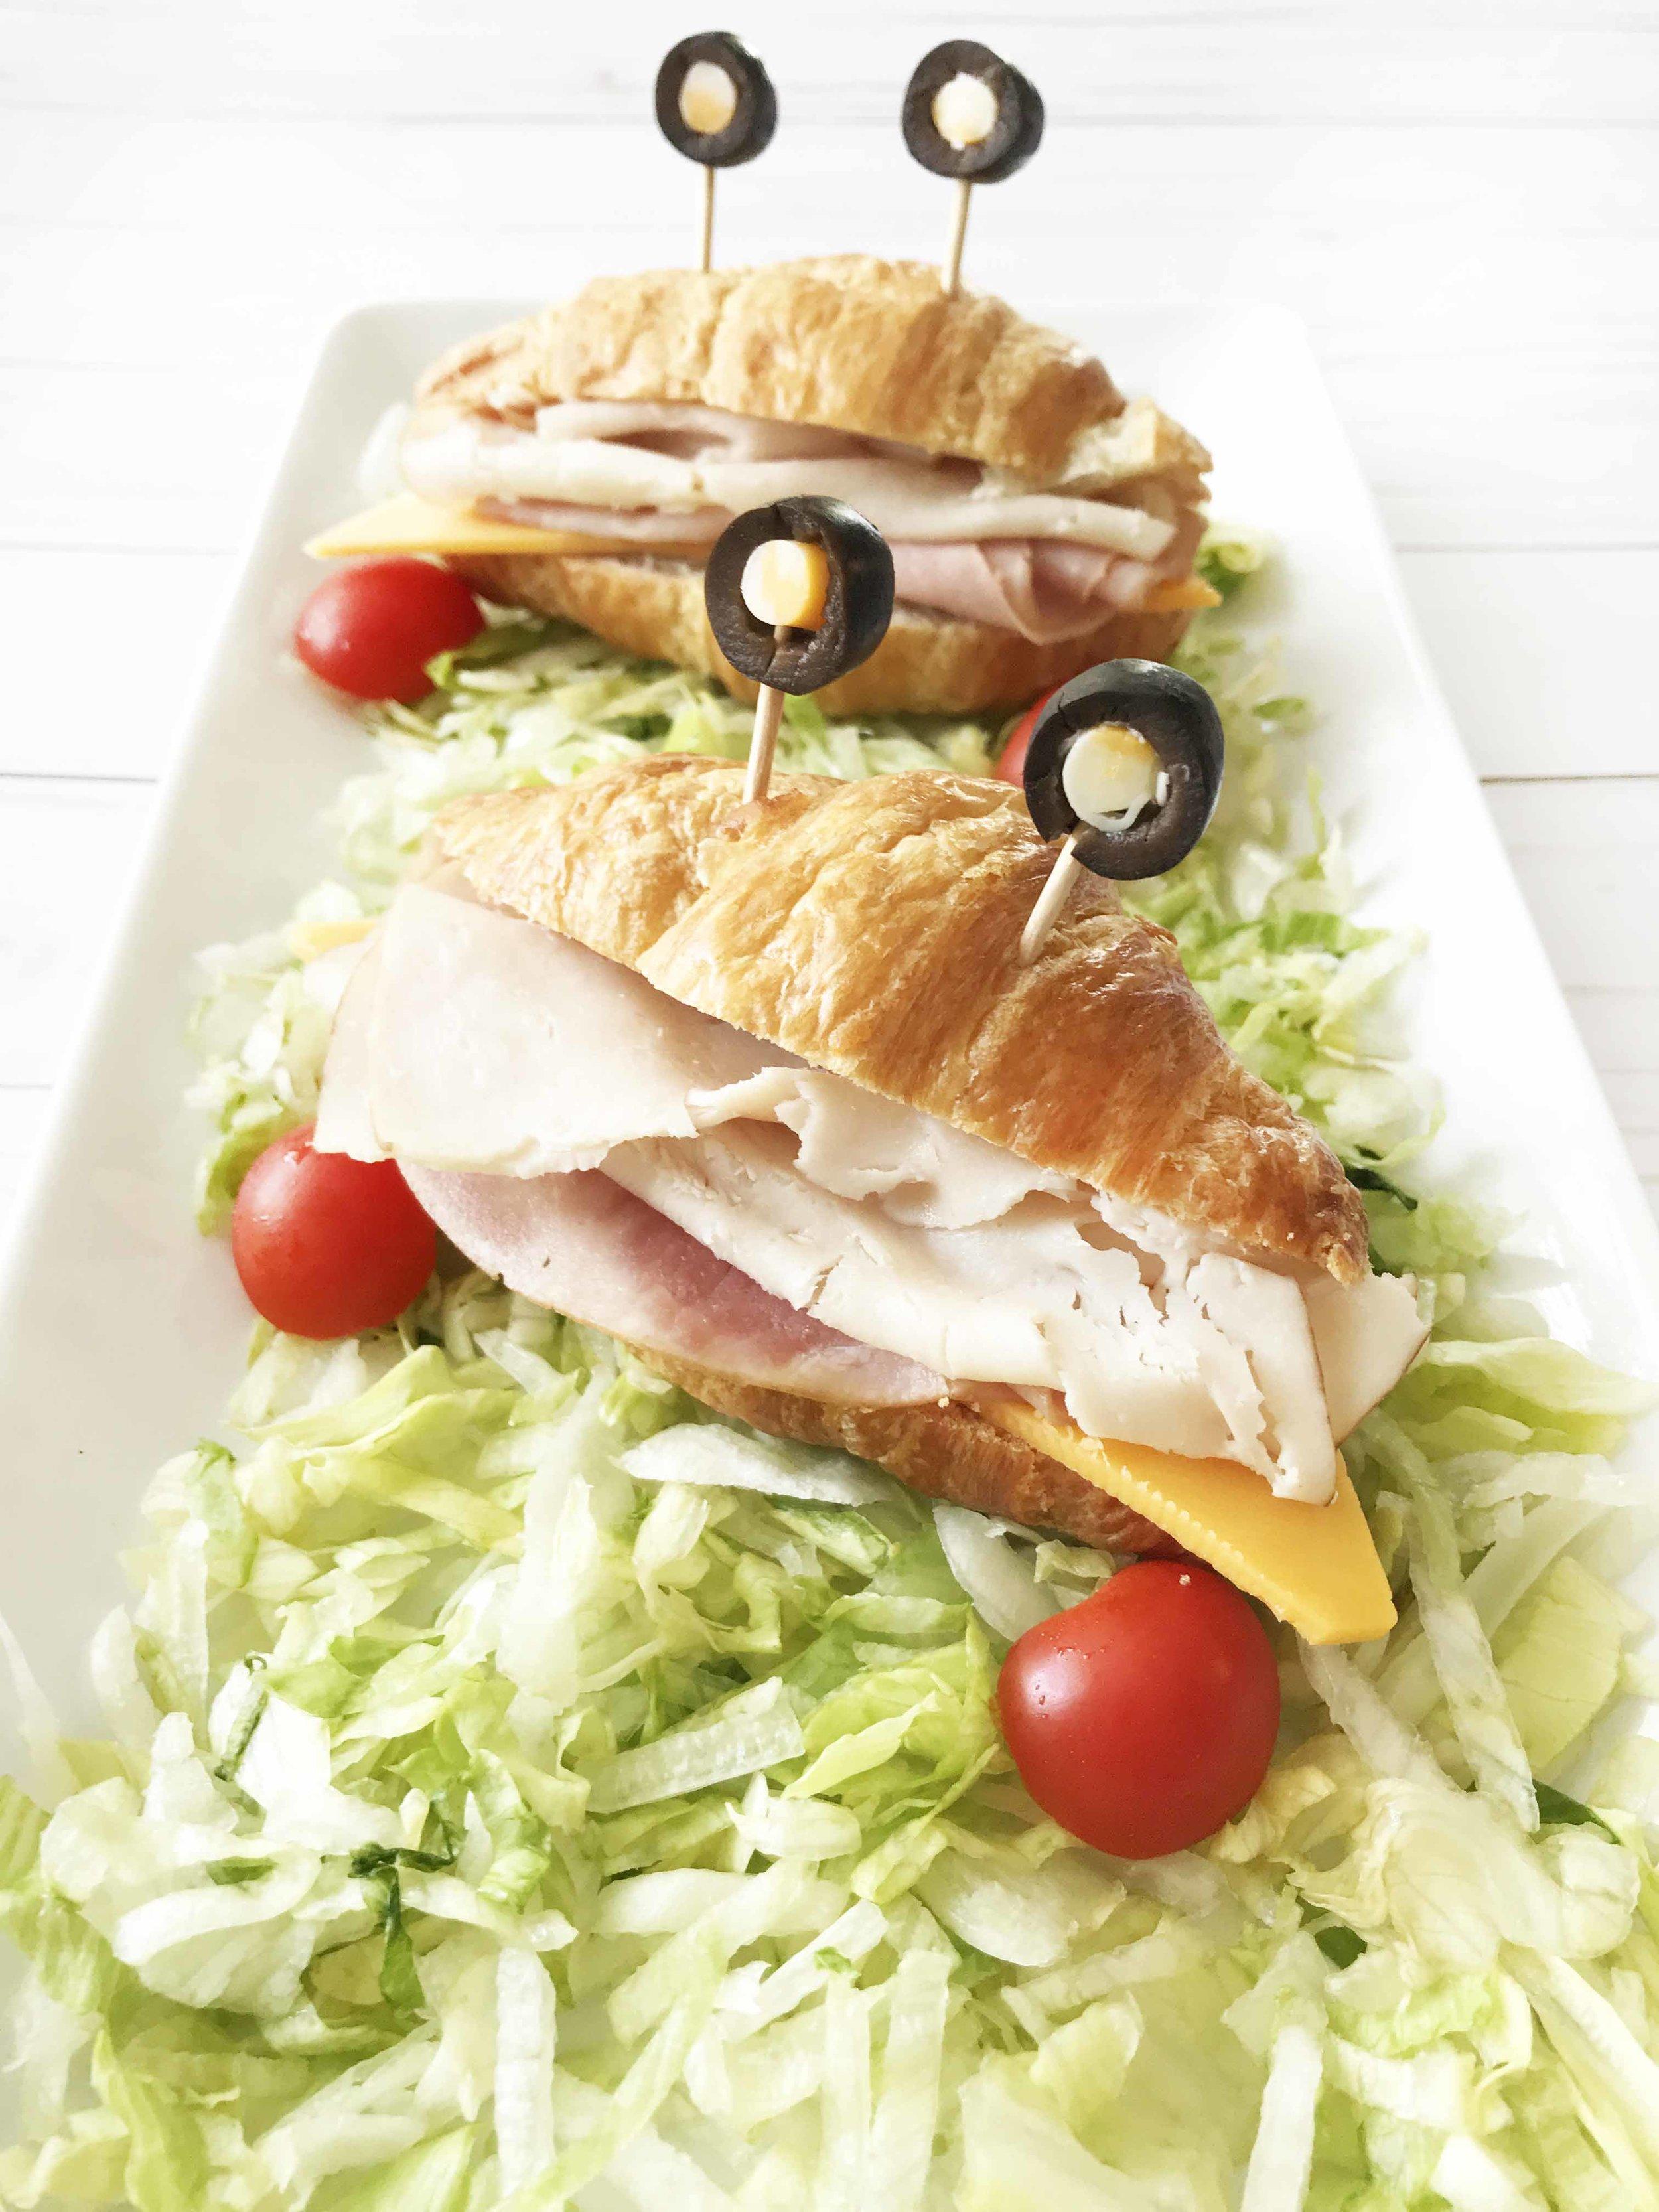 crabby-sandwich7.jpg